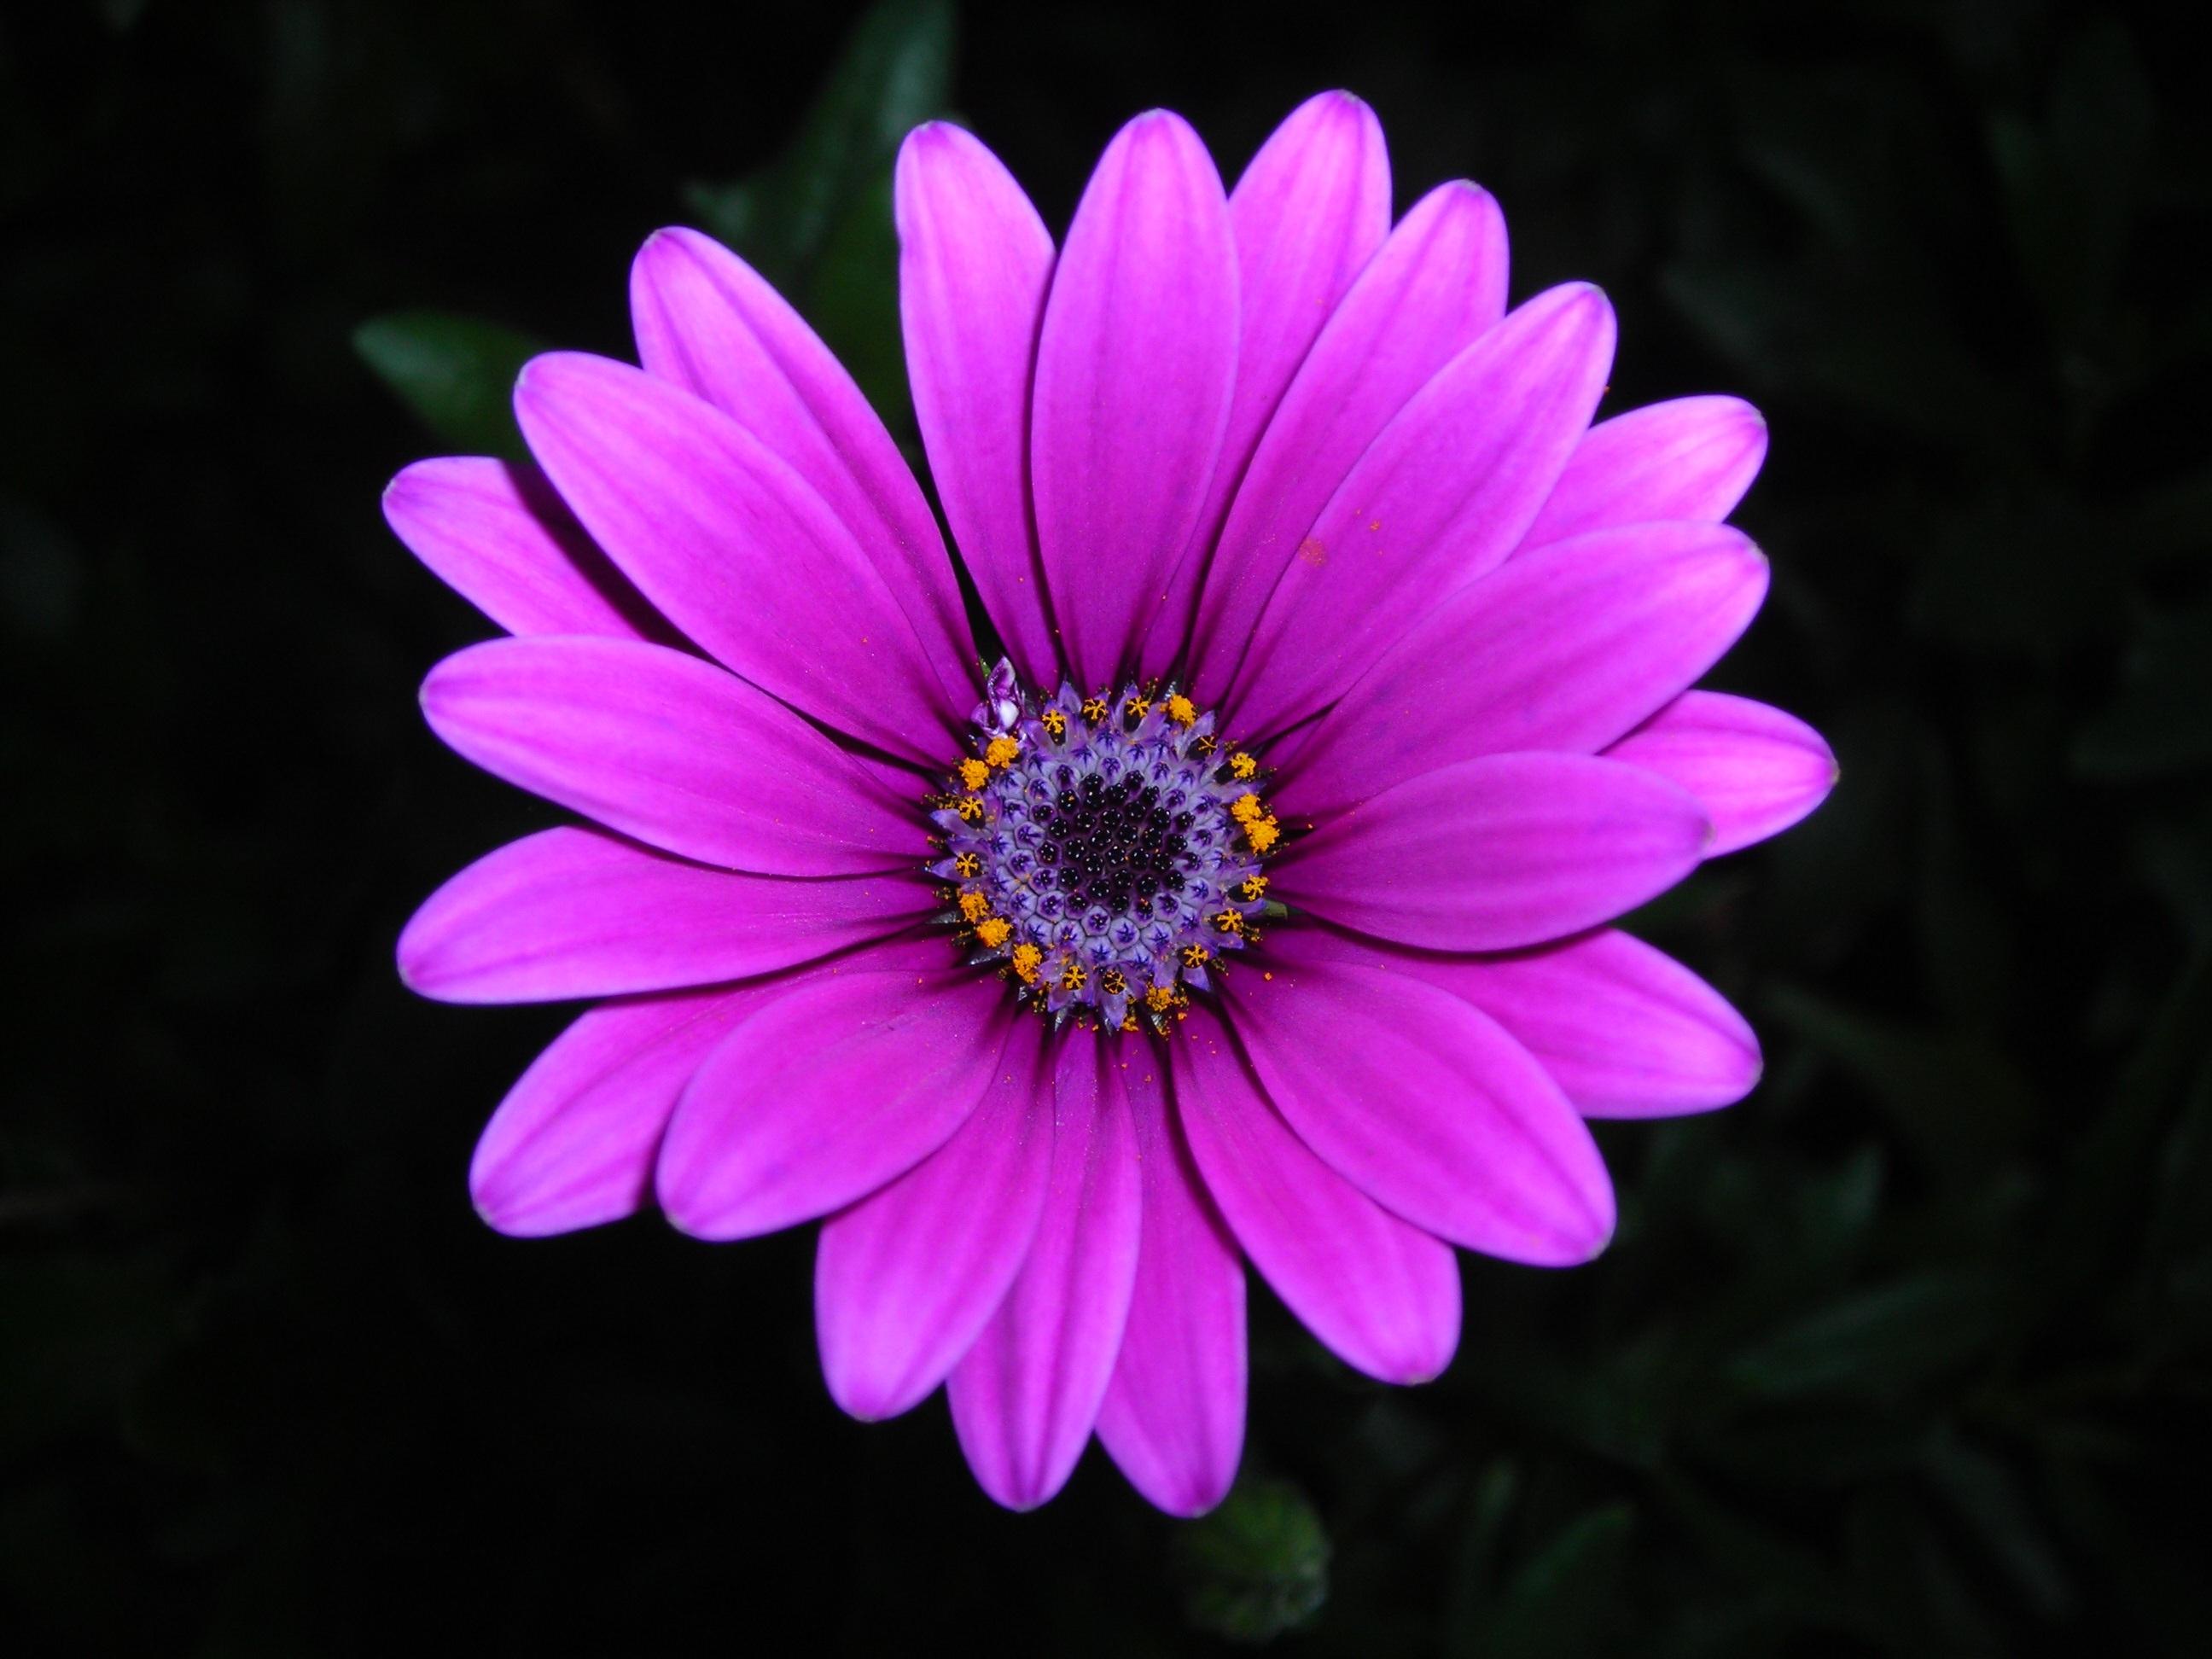 Free Images Blossom Flower Purple Petal Pink Flora Close Up